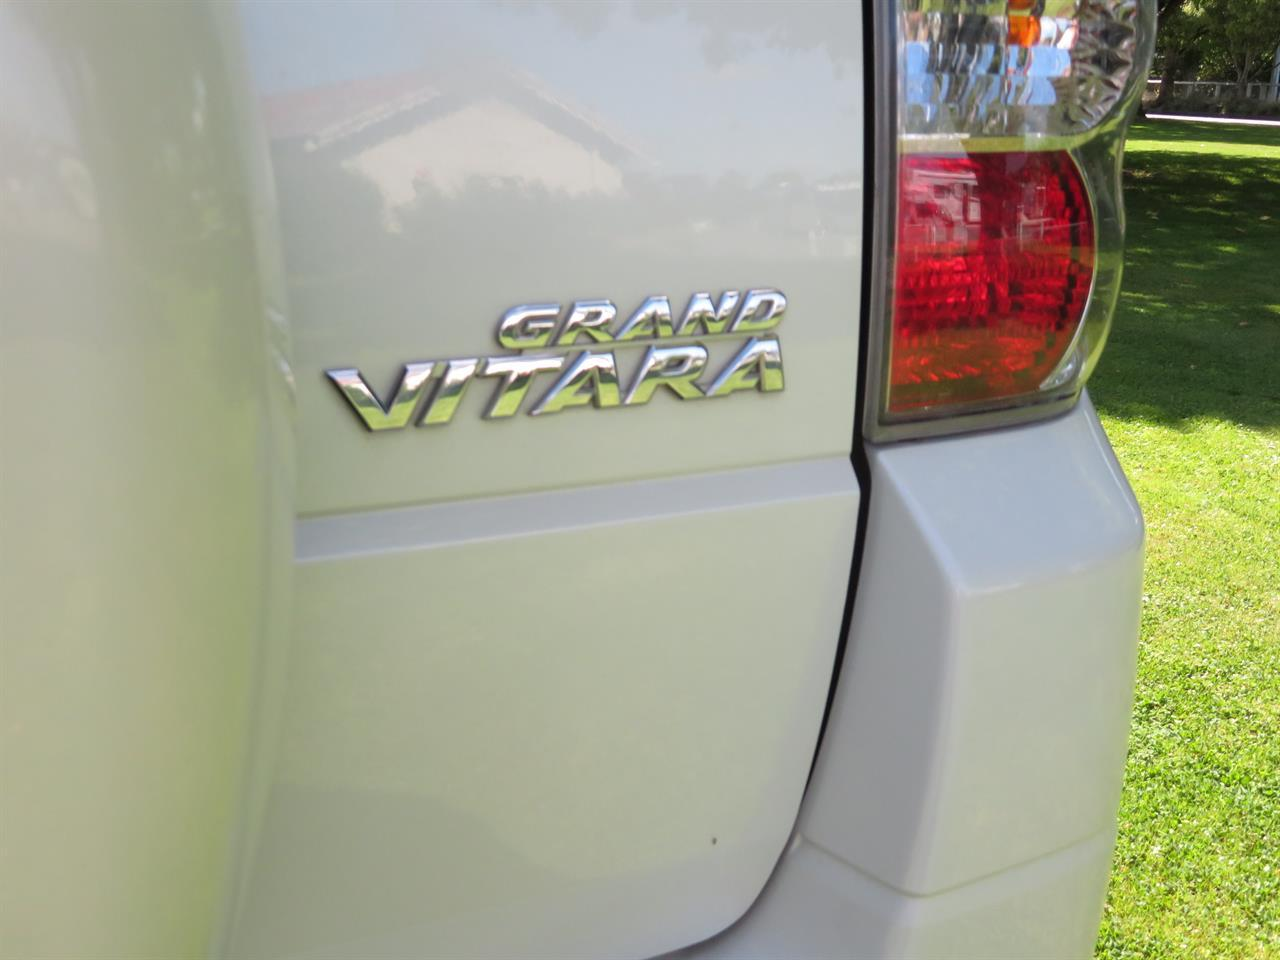 image-3, 2015 Suzuki GRAND VITARA VJLXAN 4WD at Gore